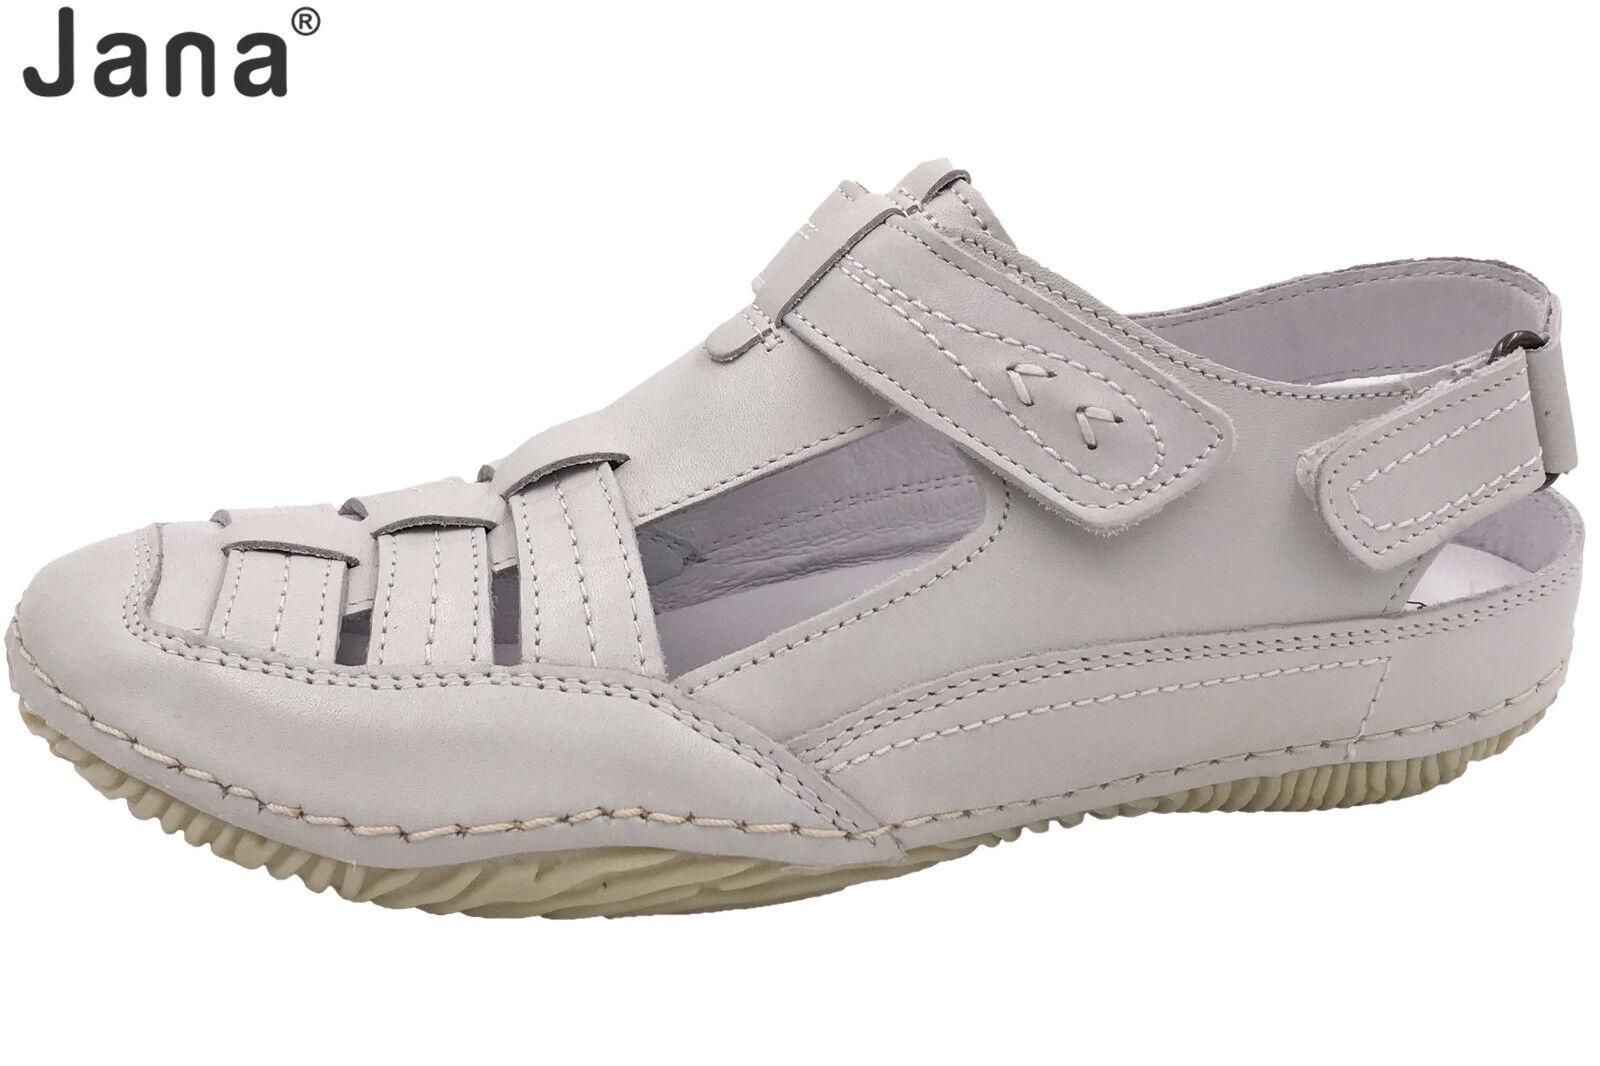 Jana Damen Sandale Weiß Echtleder Sommer Slipper Schuhe NEU 88-24617-20-109